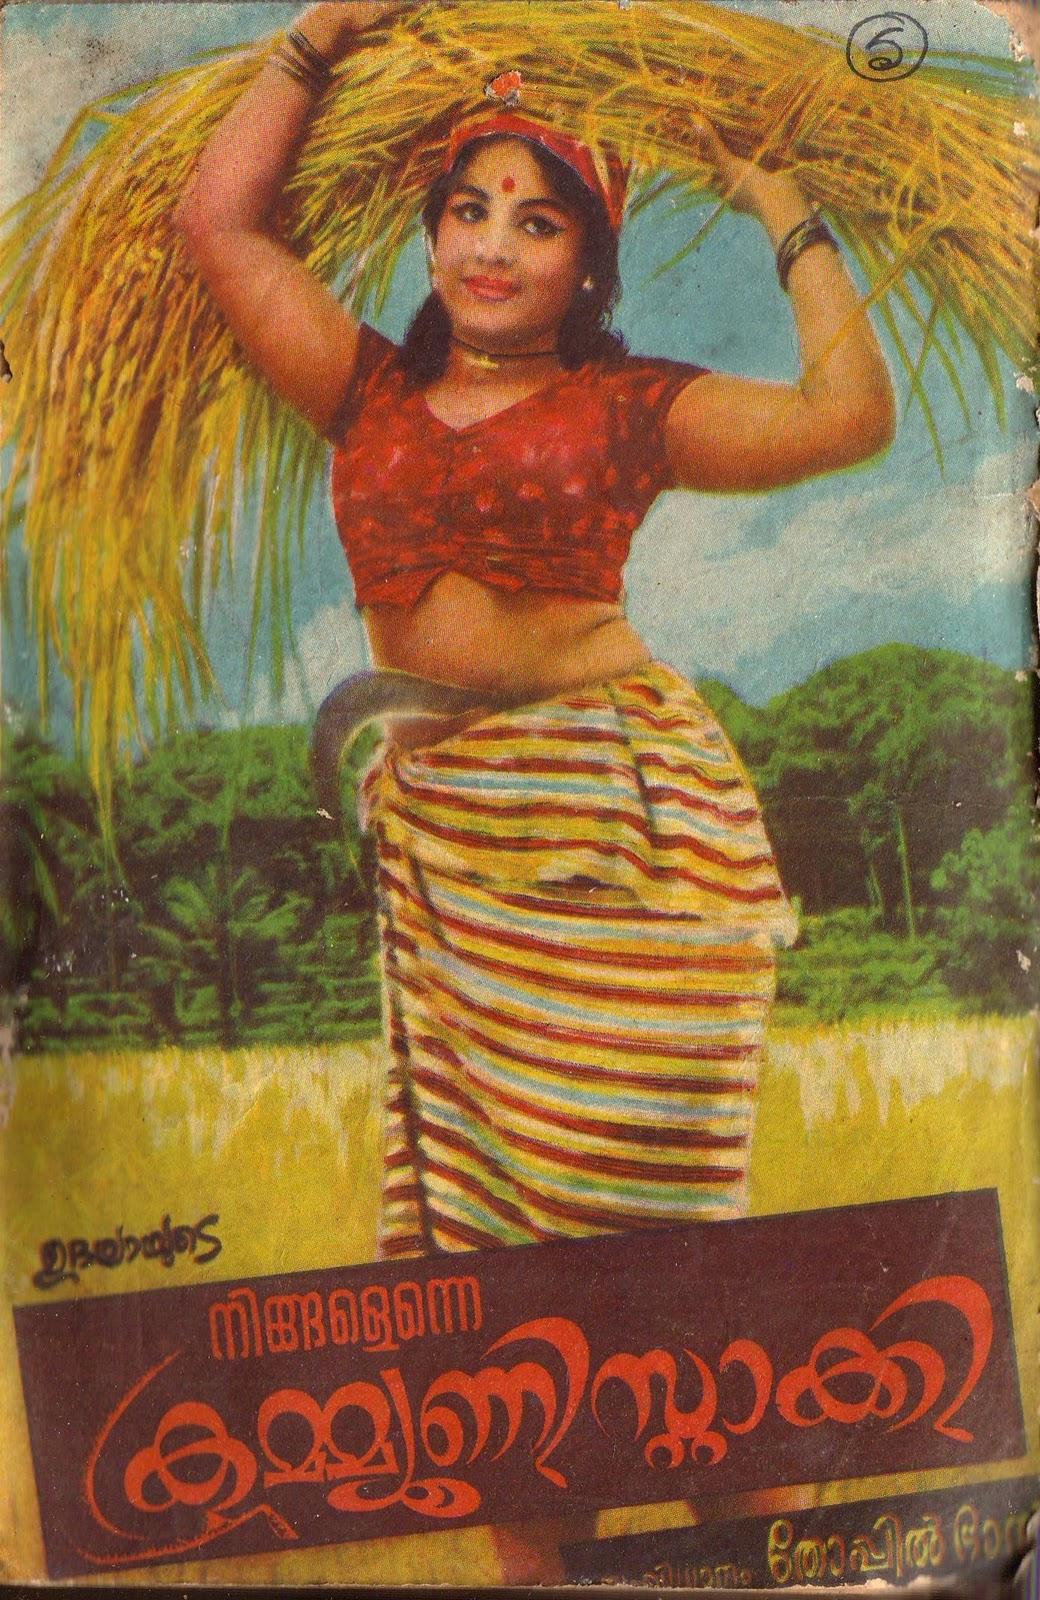 Mingle Mangles Old Malayalam Film Posters 3